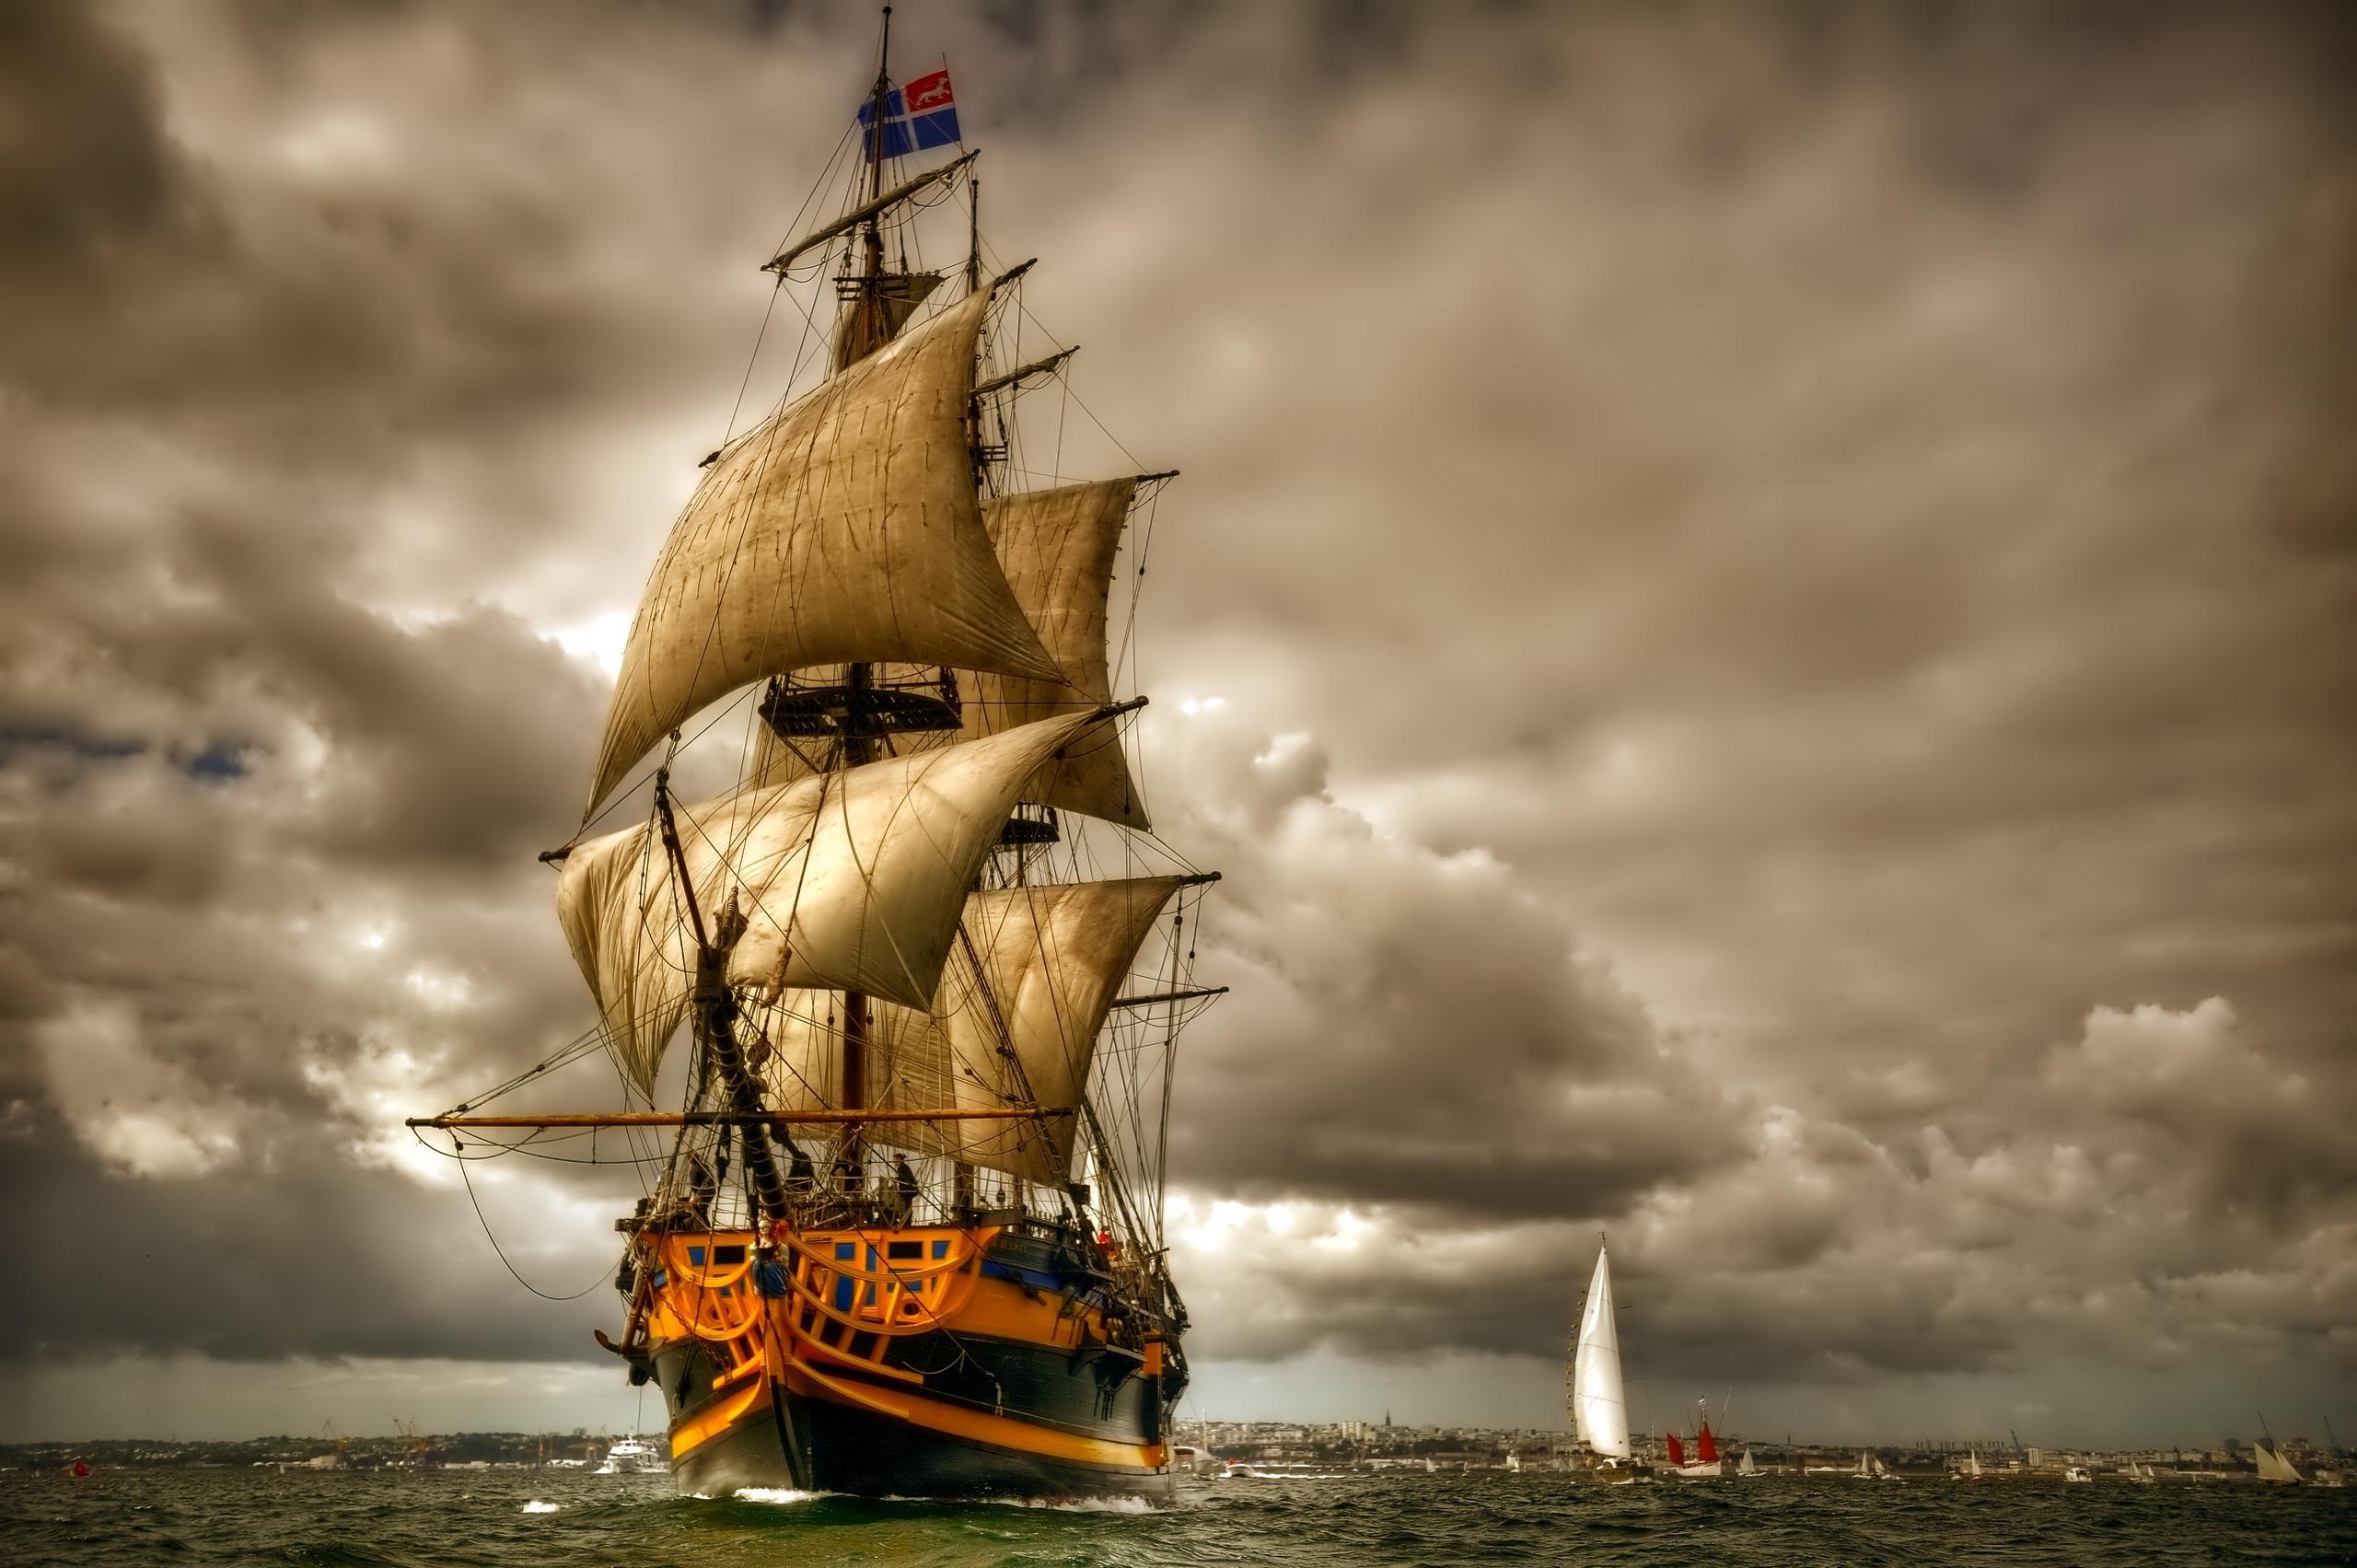 Fantasy Ship 1080p Wallpaper